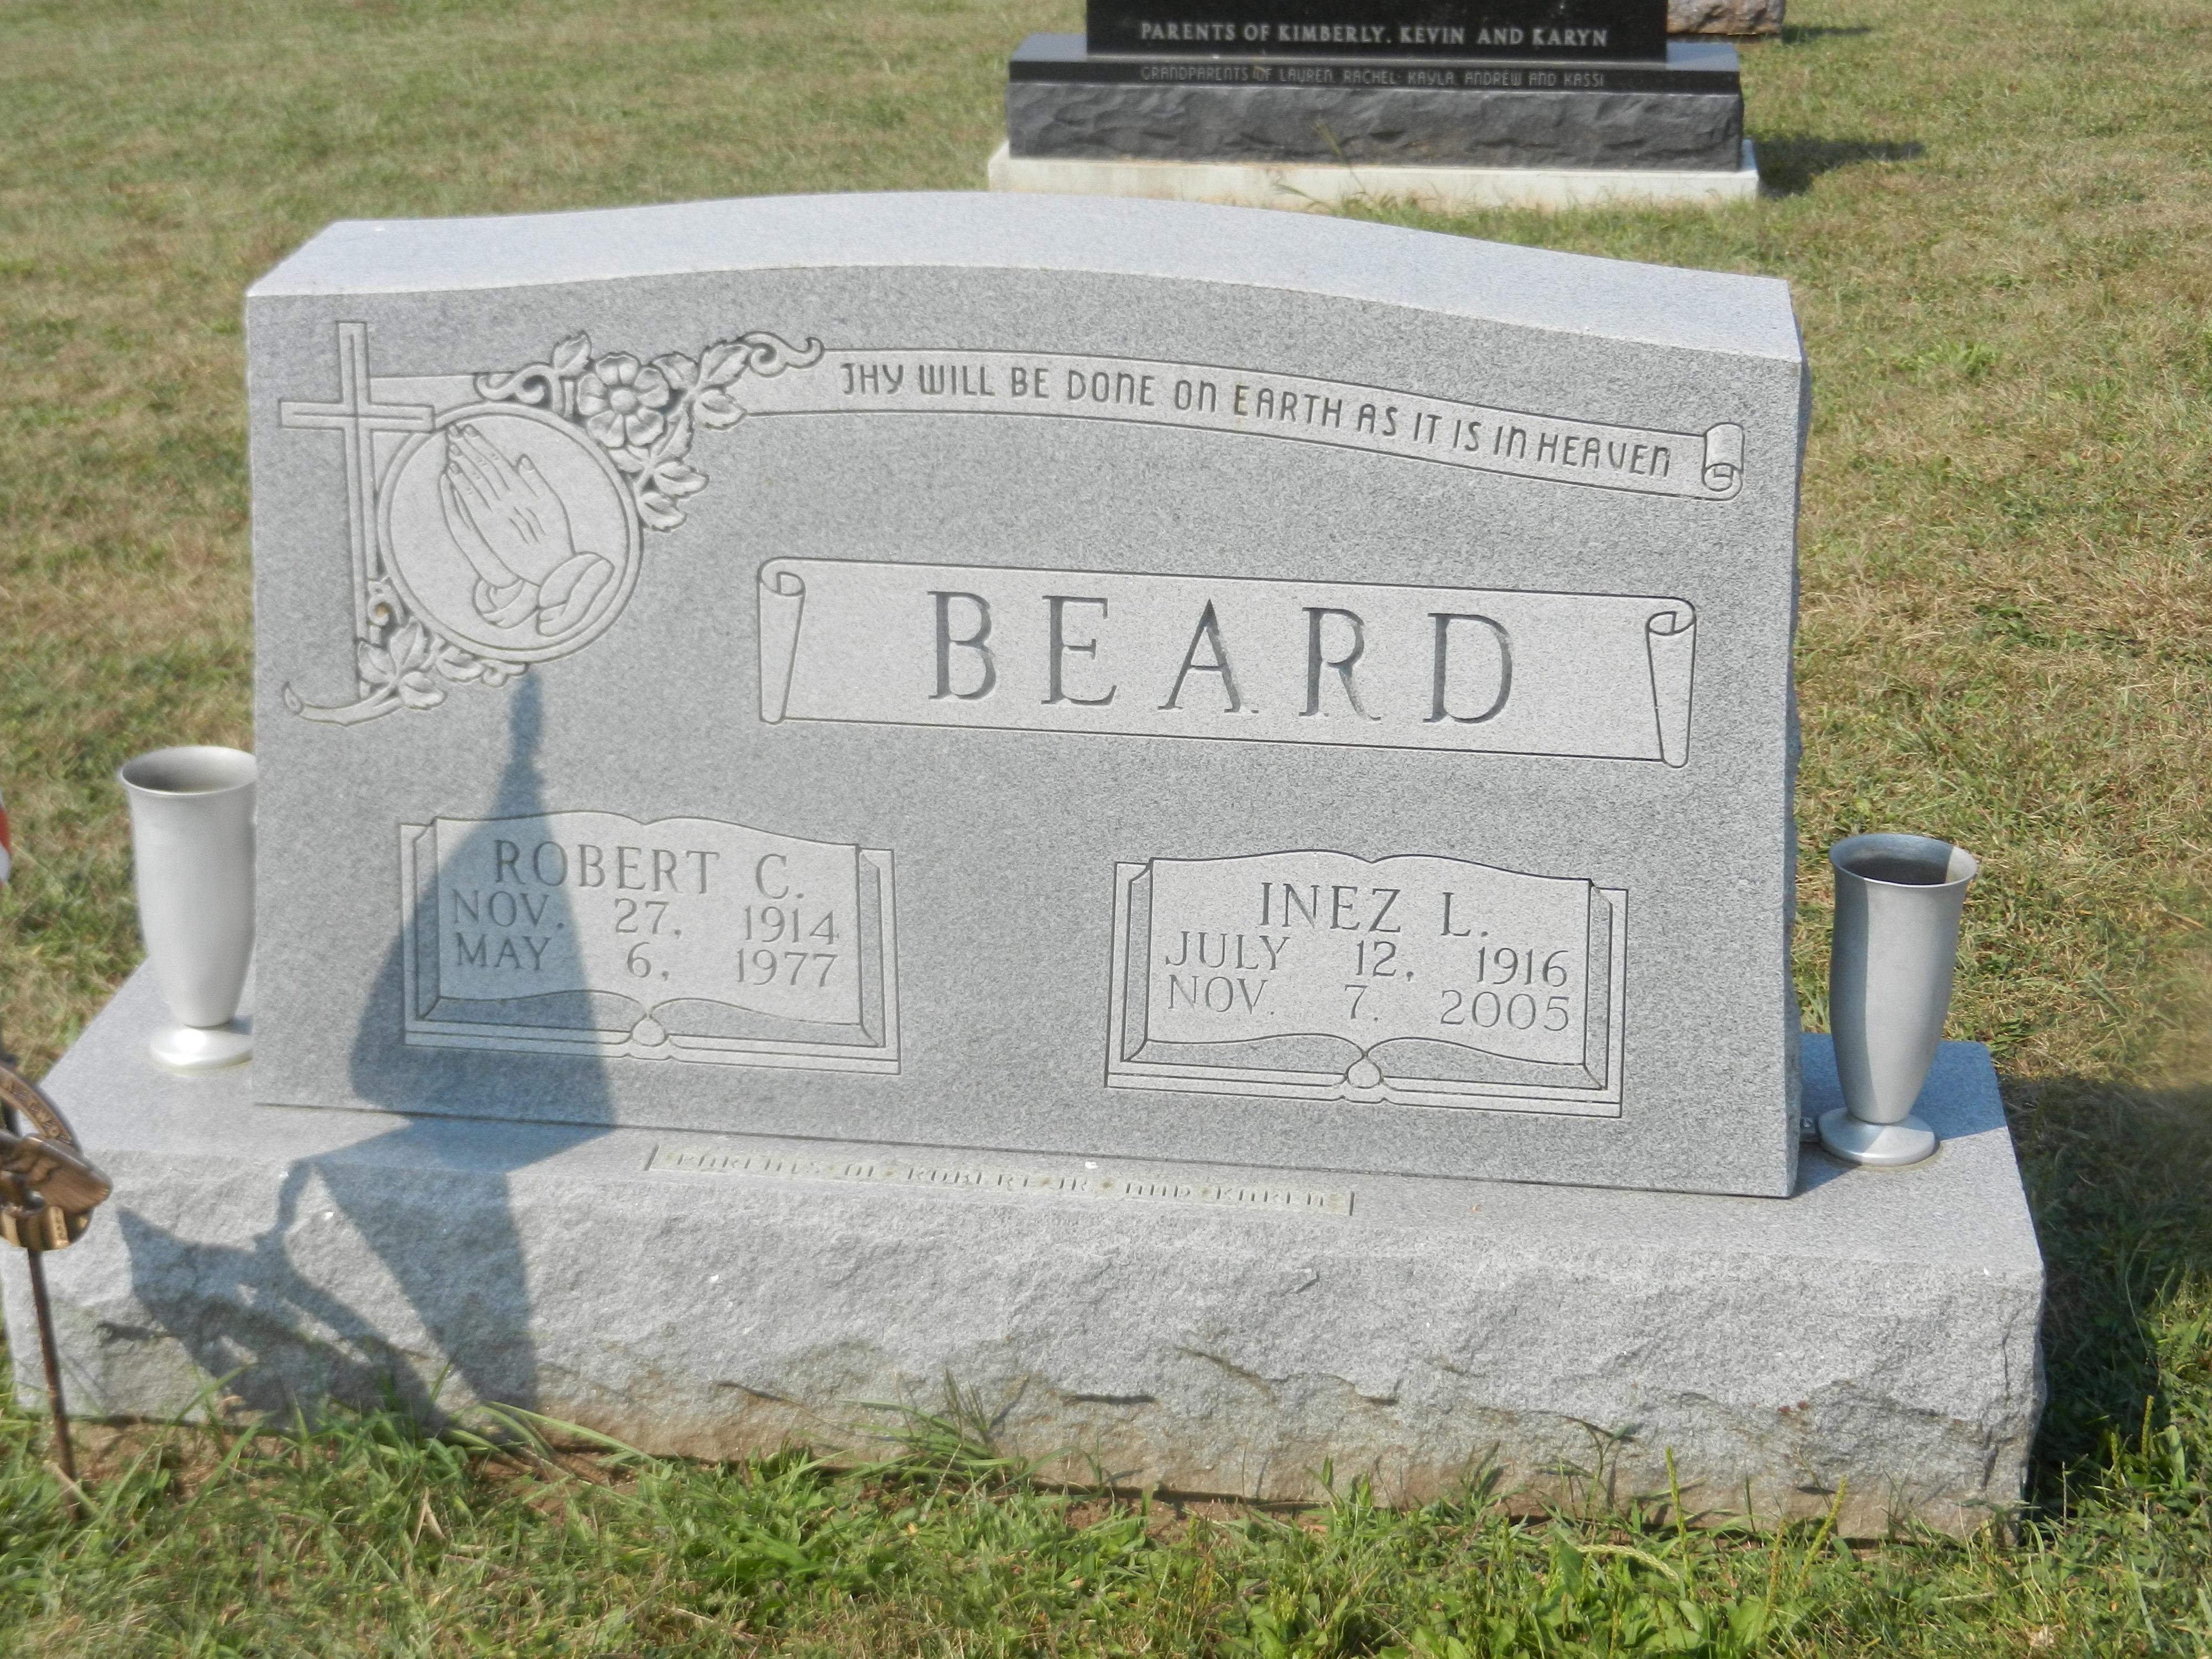 Inez L Beard